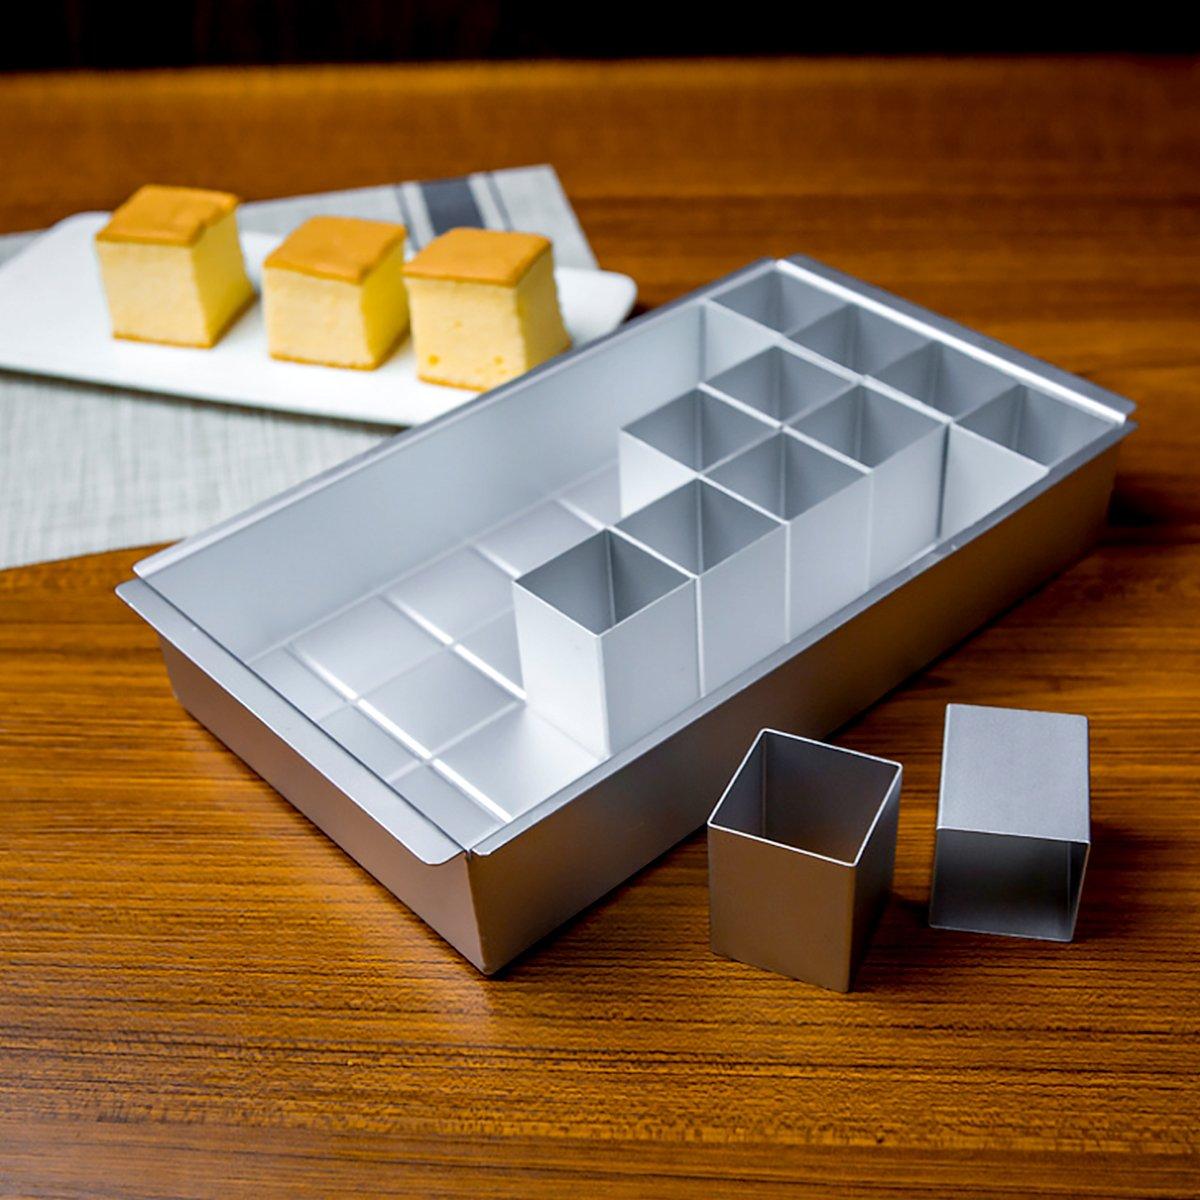 Baker Boutique Molde de Aluminio Antiadherente para Tartas, Molde para Tartas, Alfabeto con diagramas de Letras y números, fácil de Usar, Color Plateado: ...